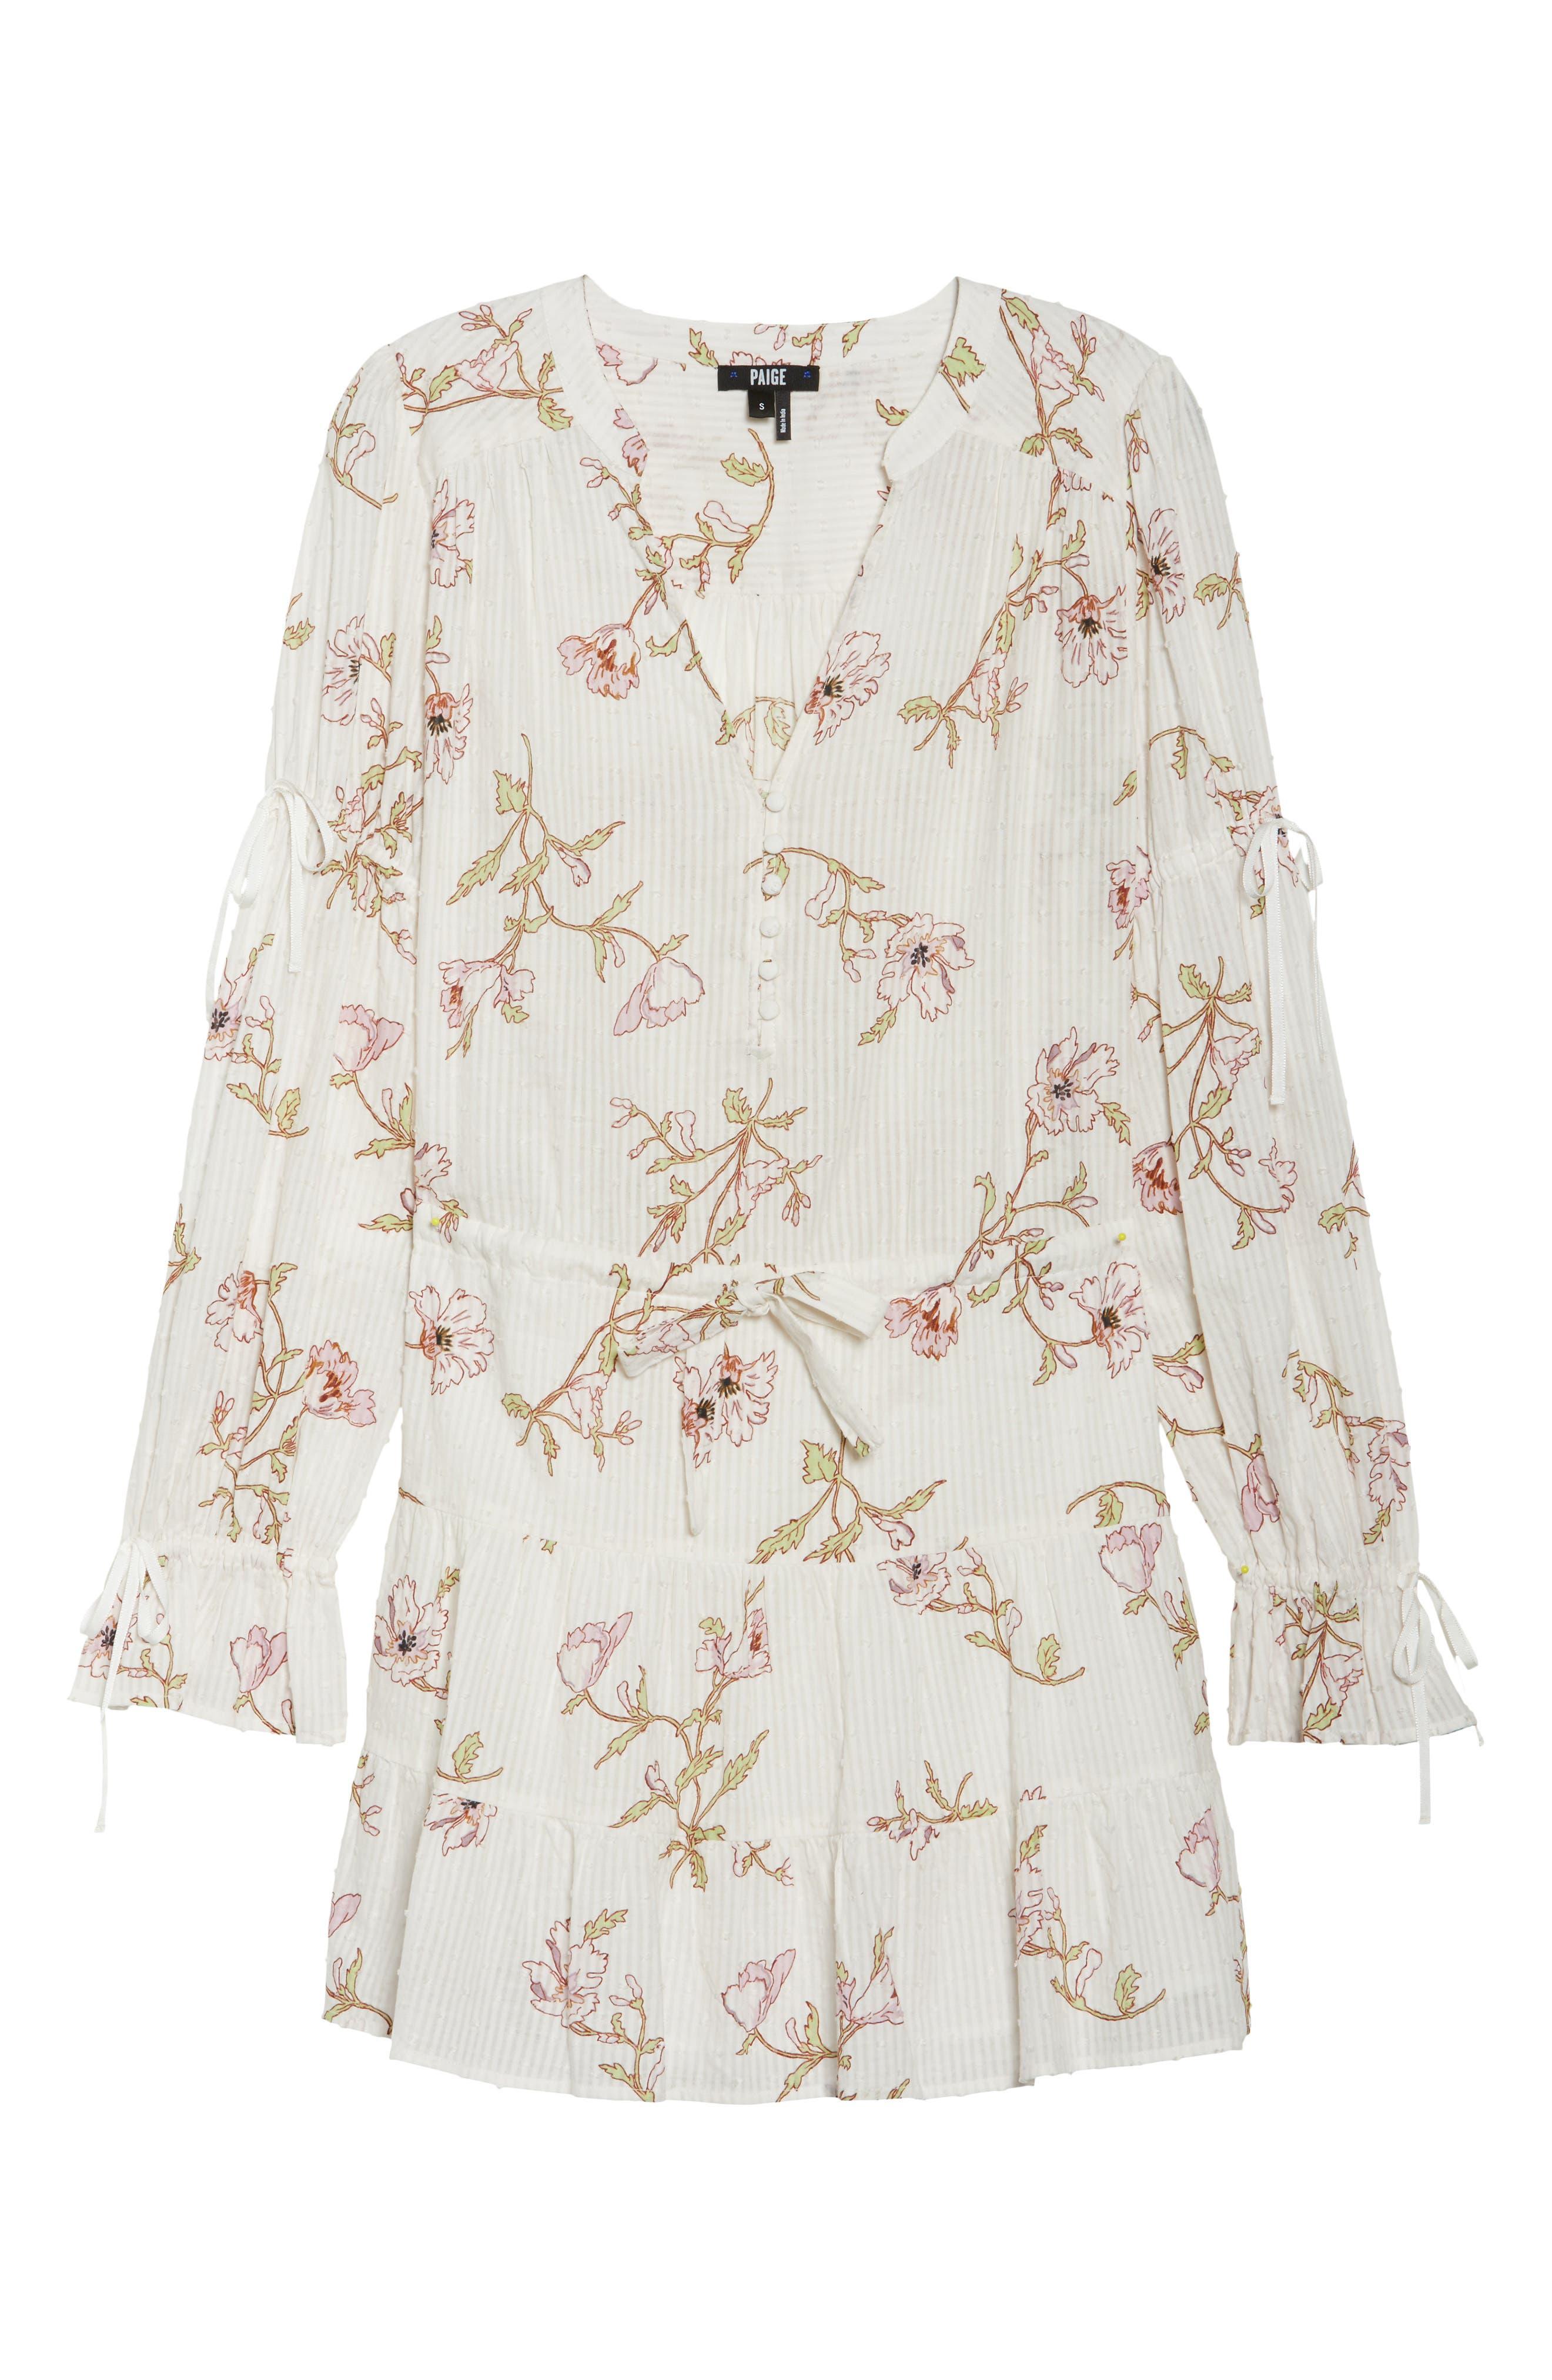 Yardley Floral Minidress,                             Alternate thumbnail 7, color,                             WHITE / MAUVE SHADOWS